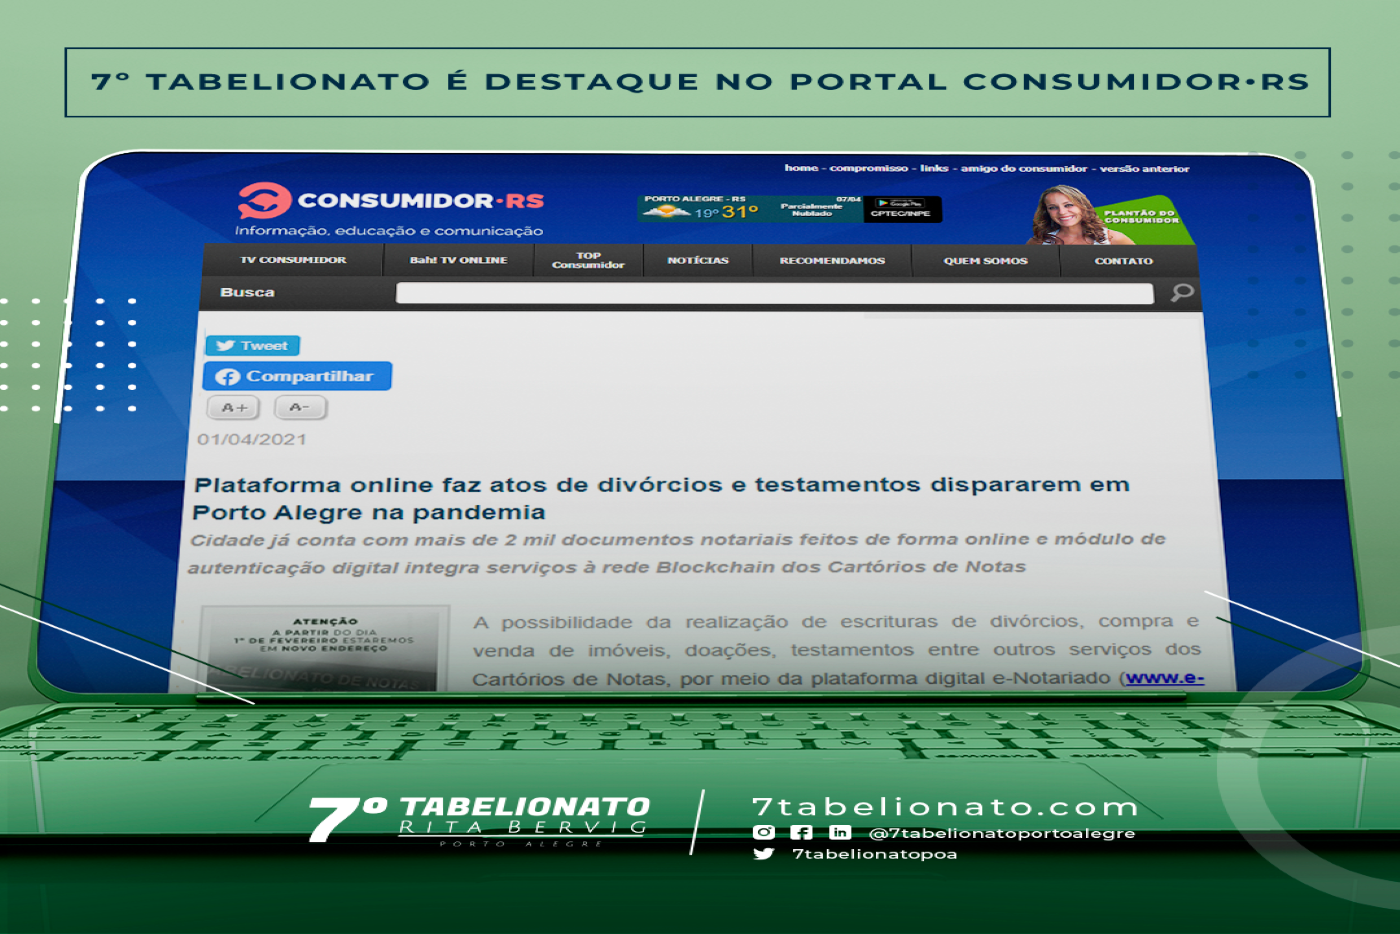 7º Tabelionato é Destaque No Portal Consumidor•RS